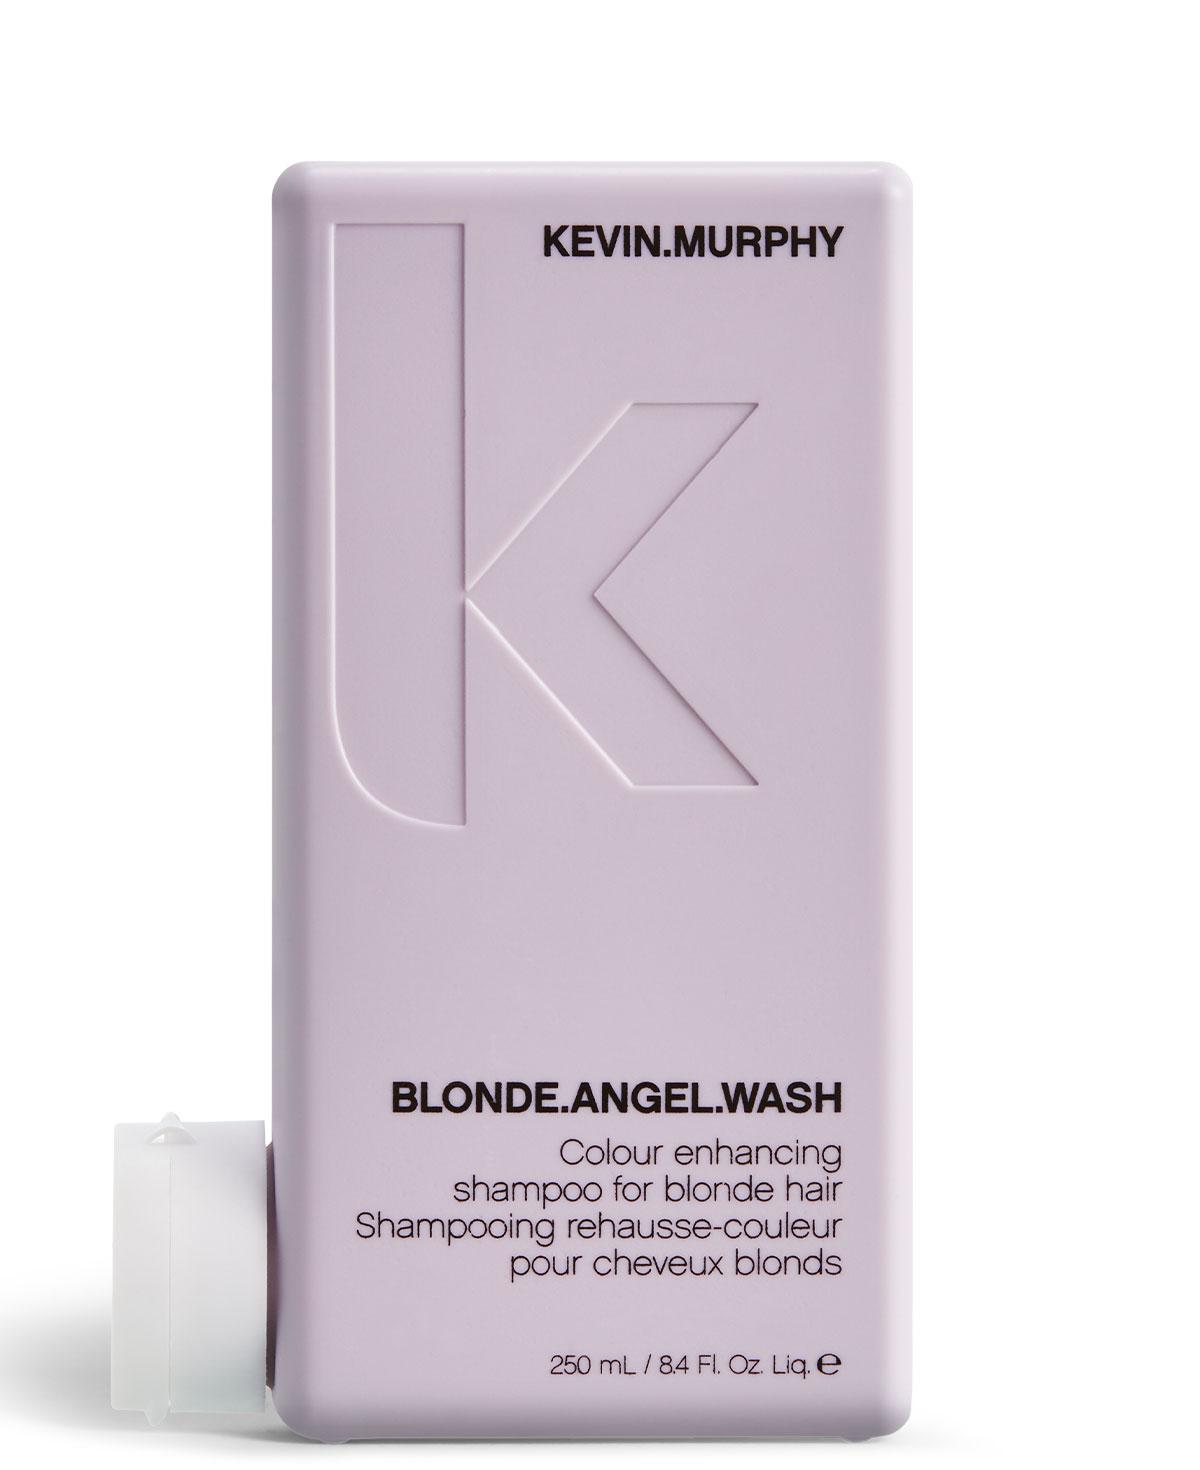 Kevin.Murphy BLONDE.ANGEL.WASH 250ml